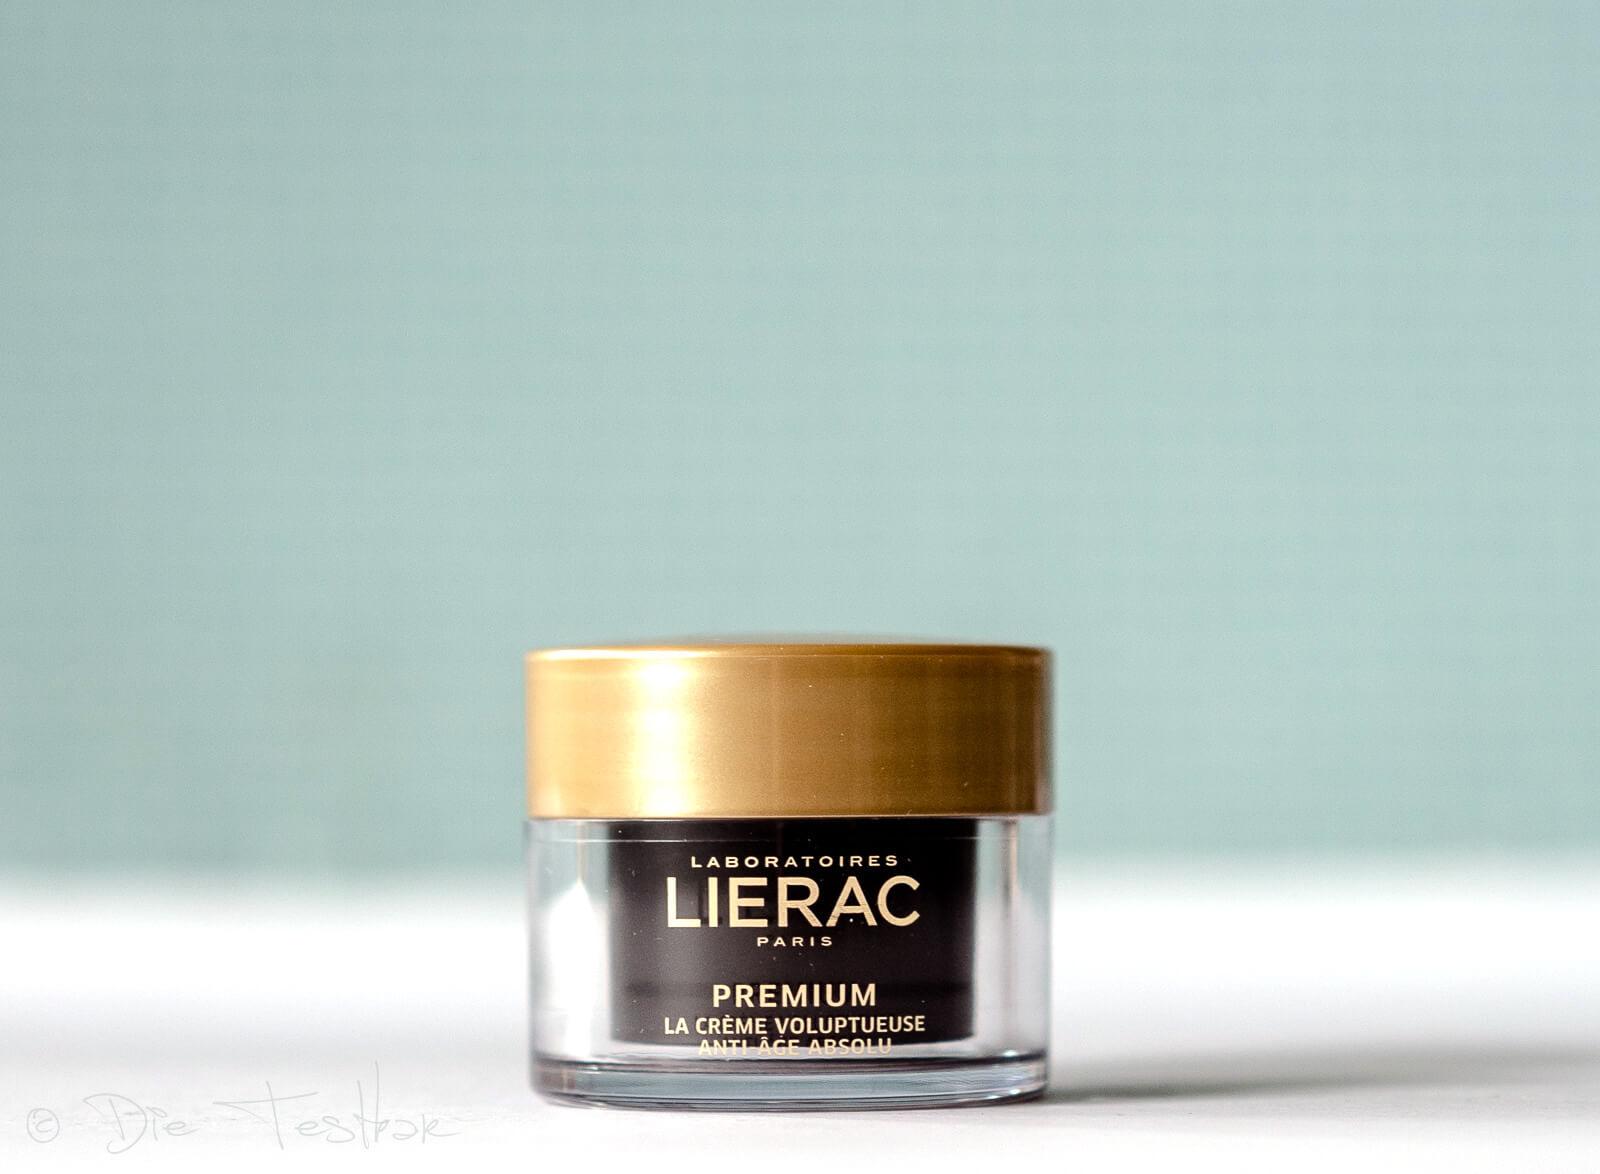 LIERAC - Premium Creme Voluptueuse